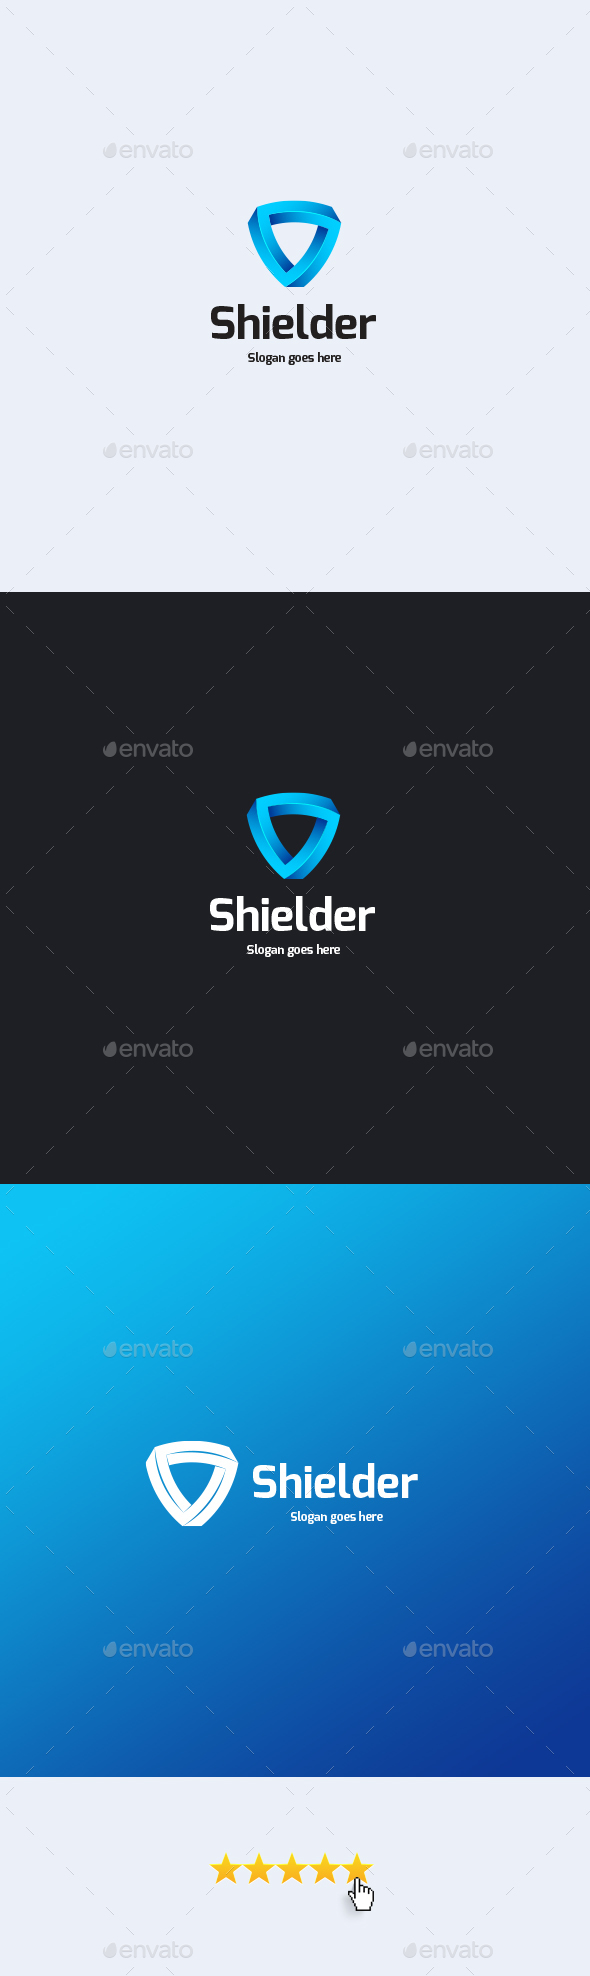 Shielder Logo Template - Objects Logo Templates